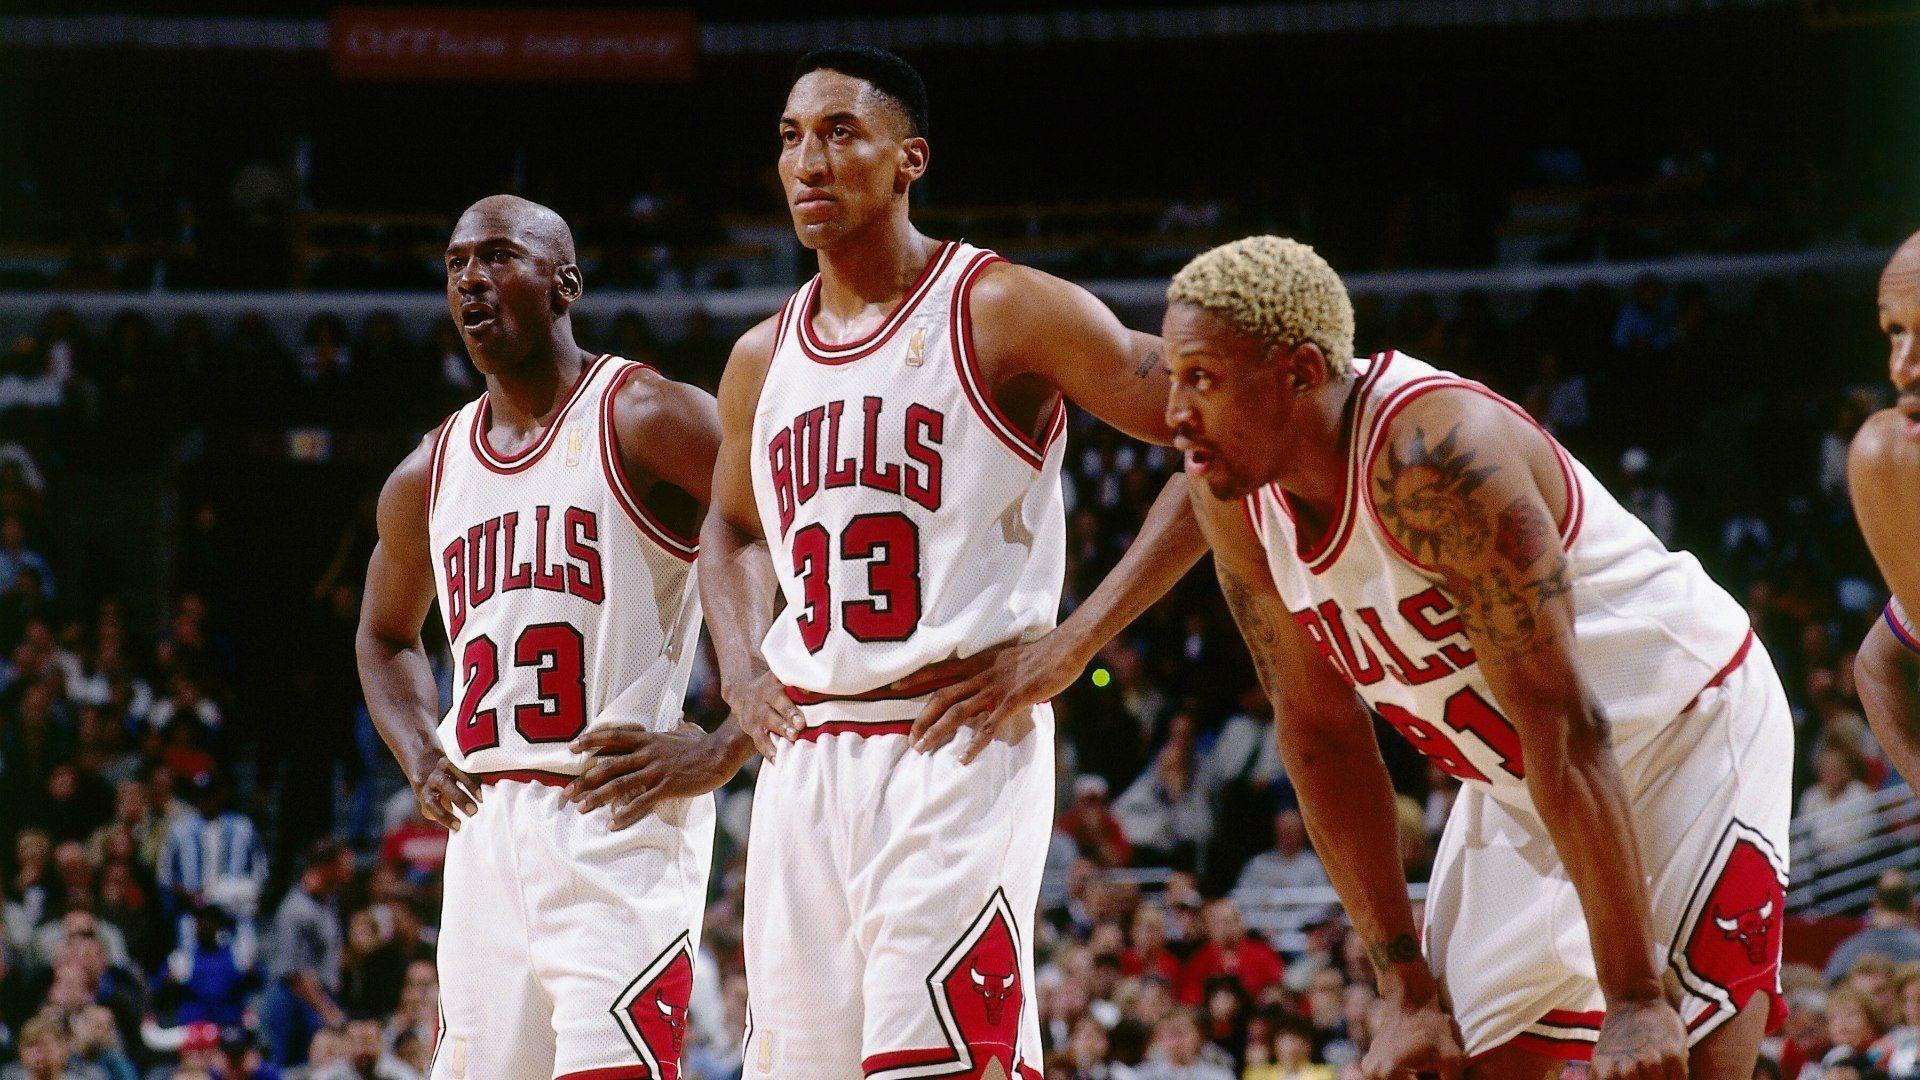 Basketball NBA game player michael jordan chicago bulls wallpaper .